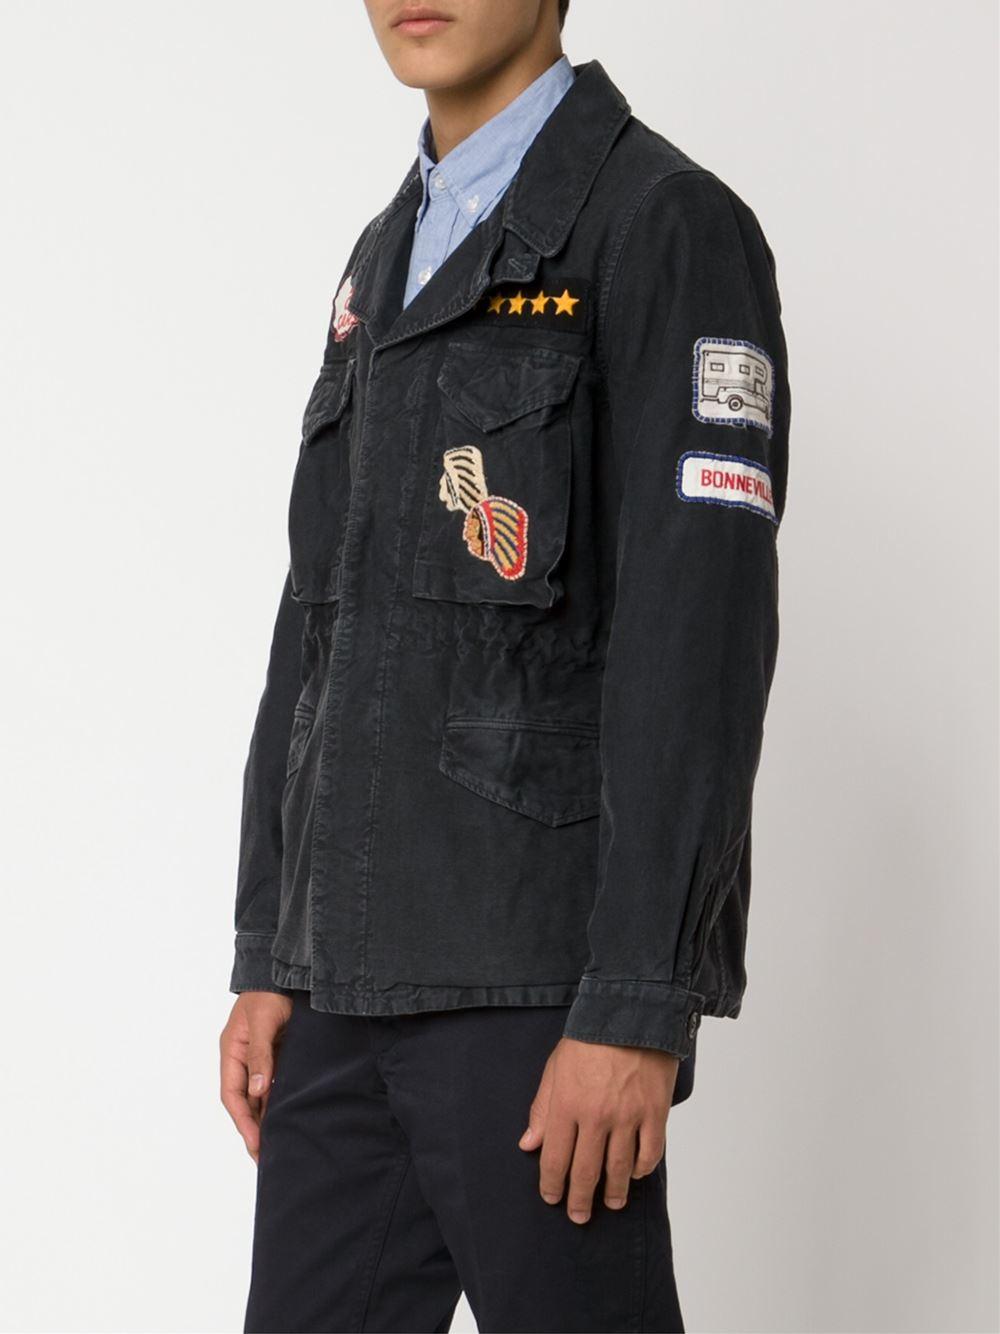 Visvim Patches Embellished Military Jacket In Blue For Men | Lyst